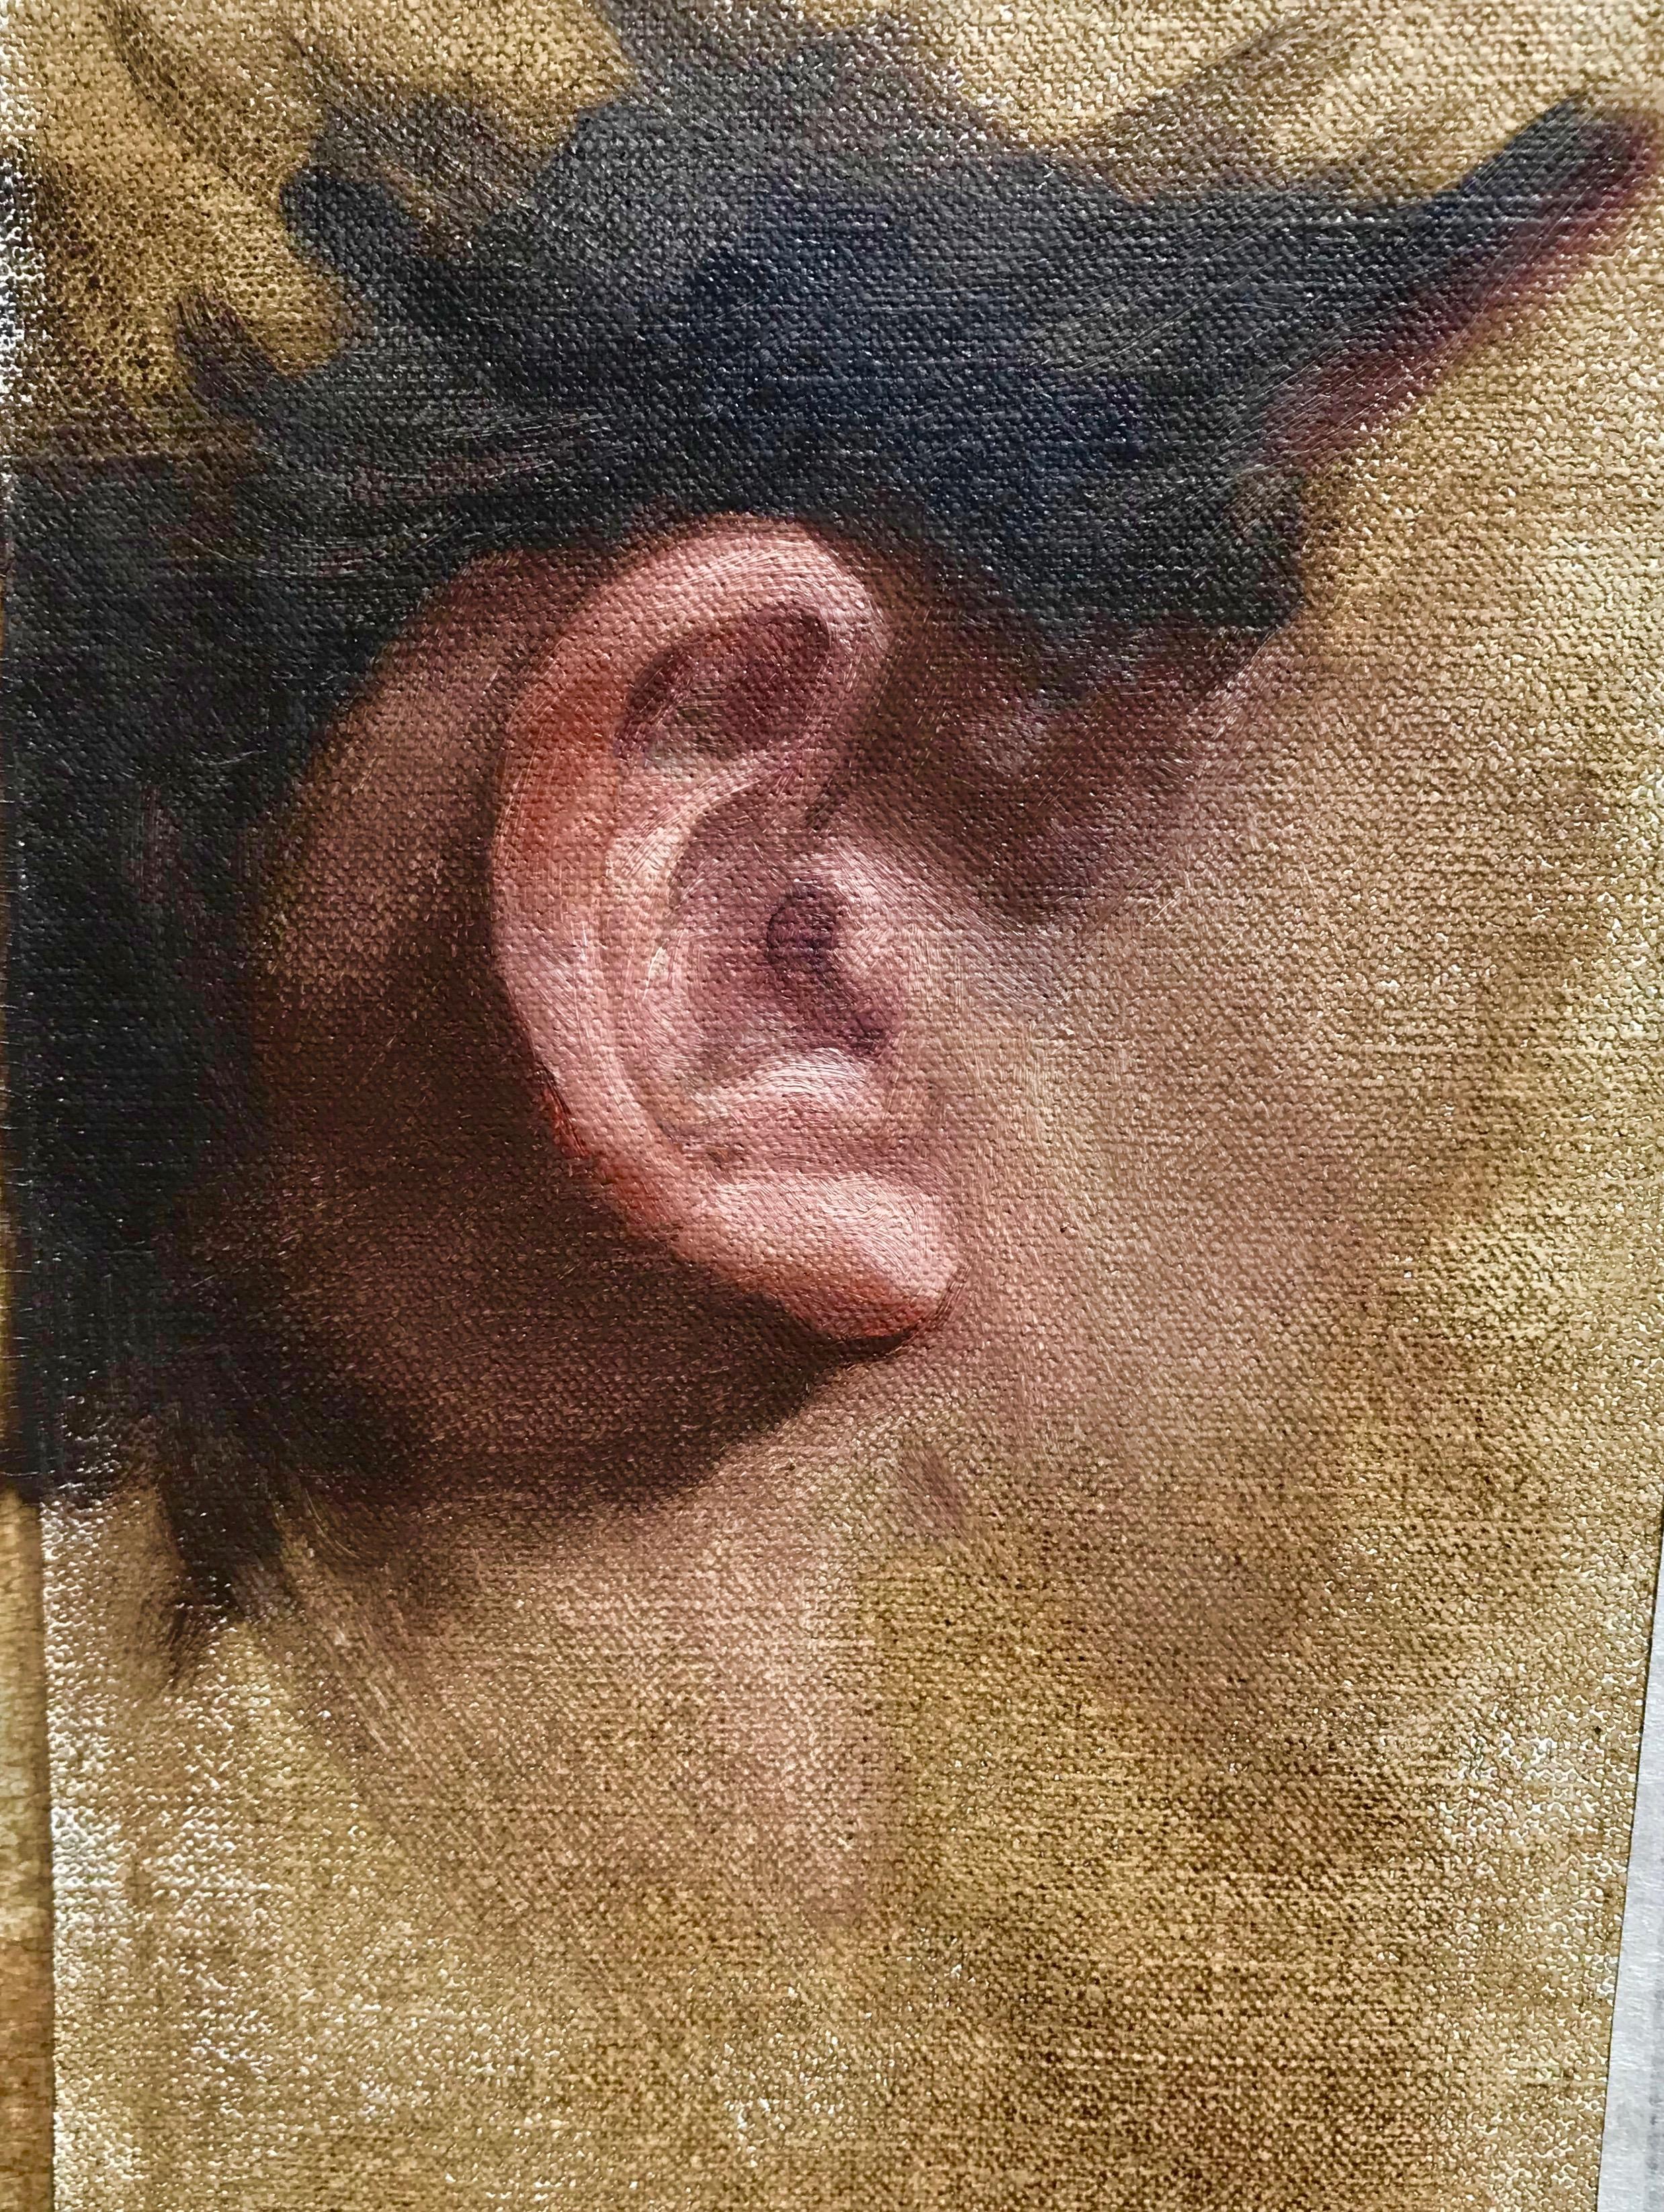 Ear study